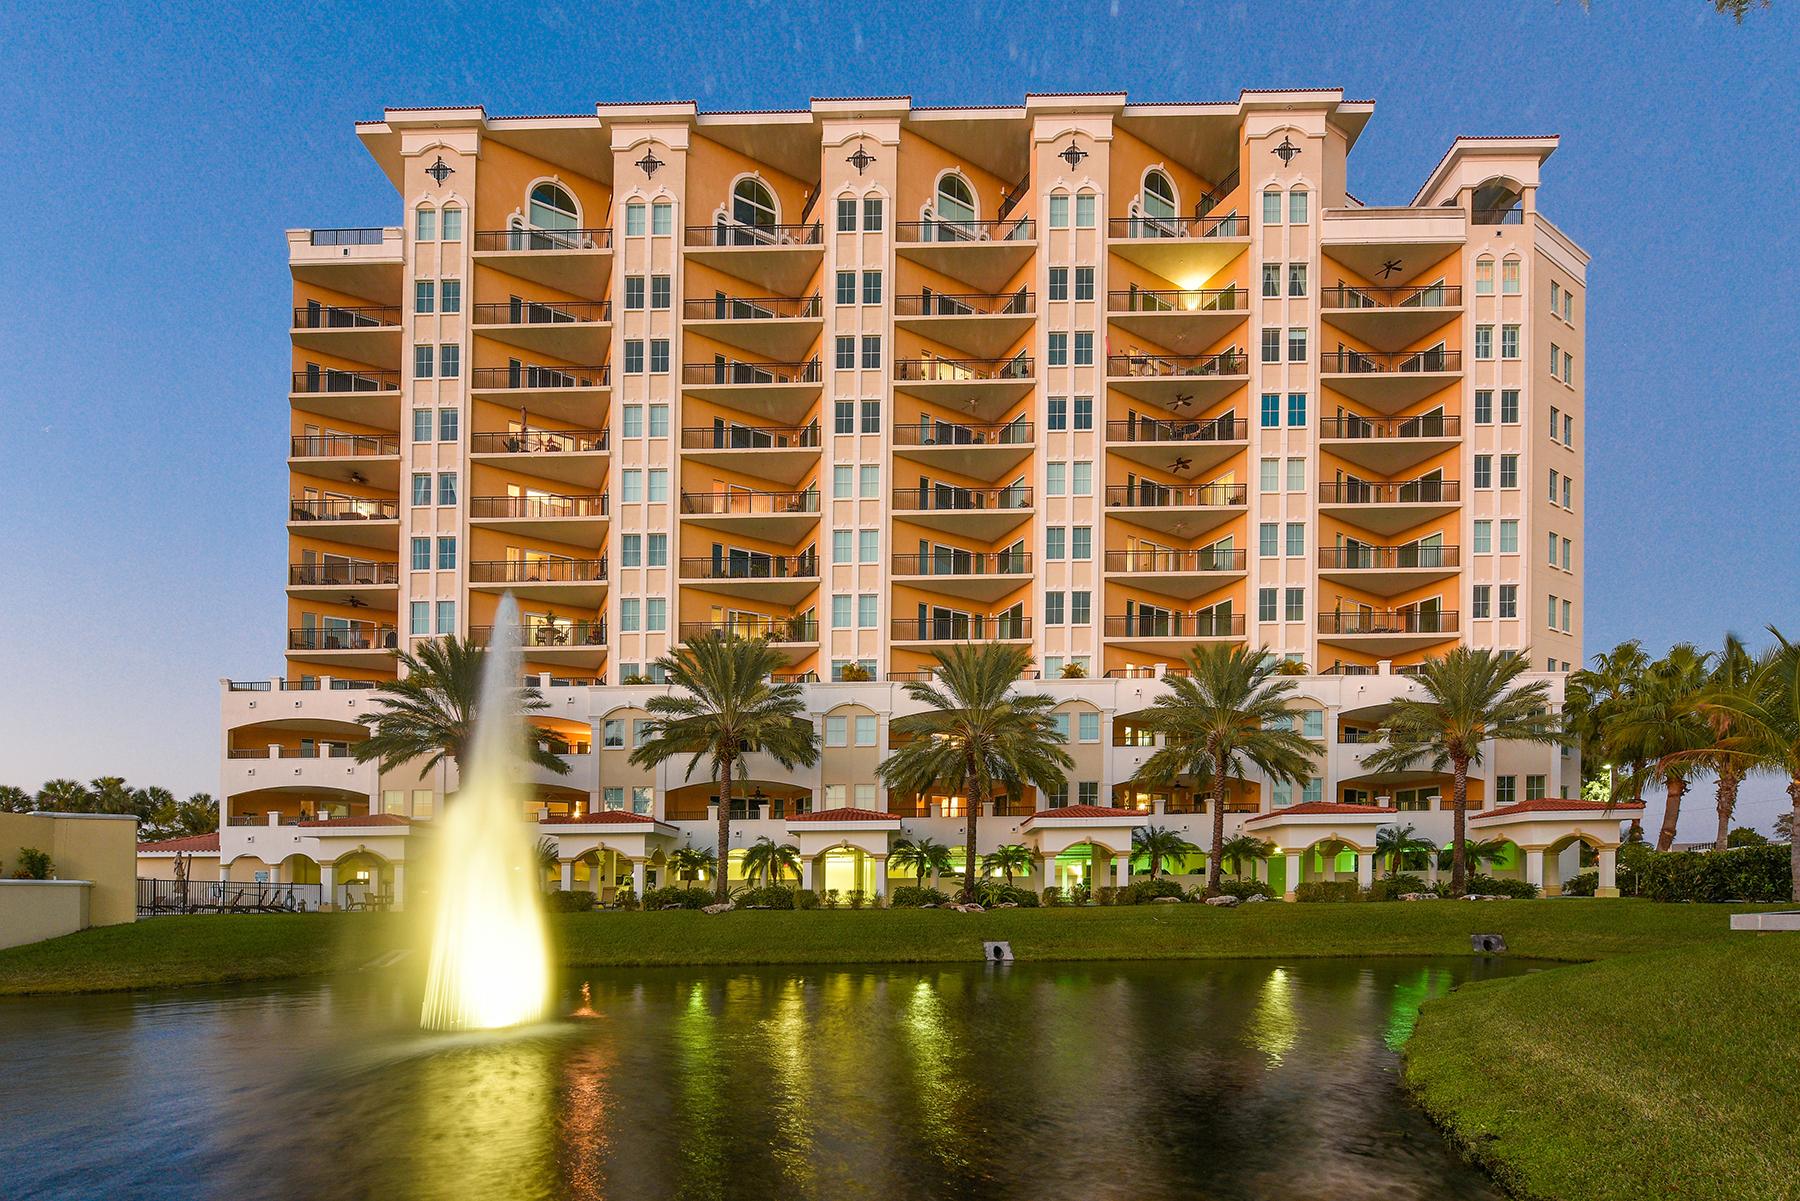 Condominium for Sale at THE PALMS AT RIVIERA DUNES 501 Haben Blvd 1104, Palmetto, Florida 34221 United States